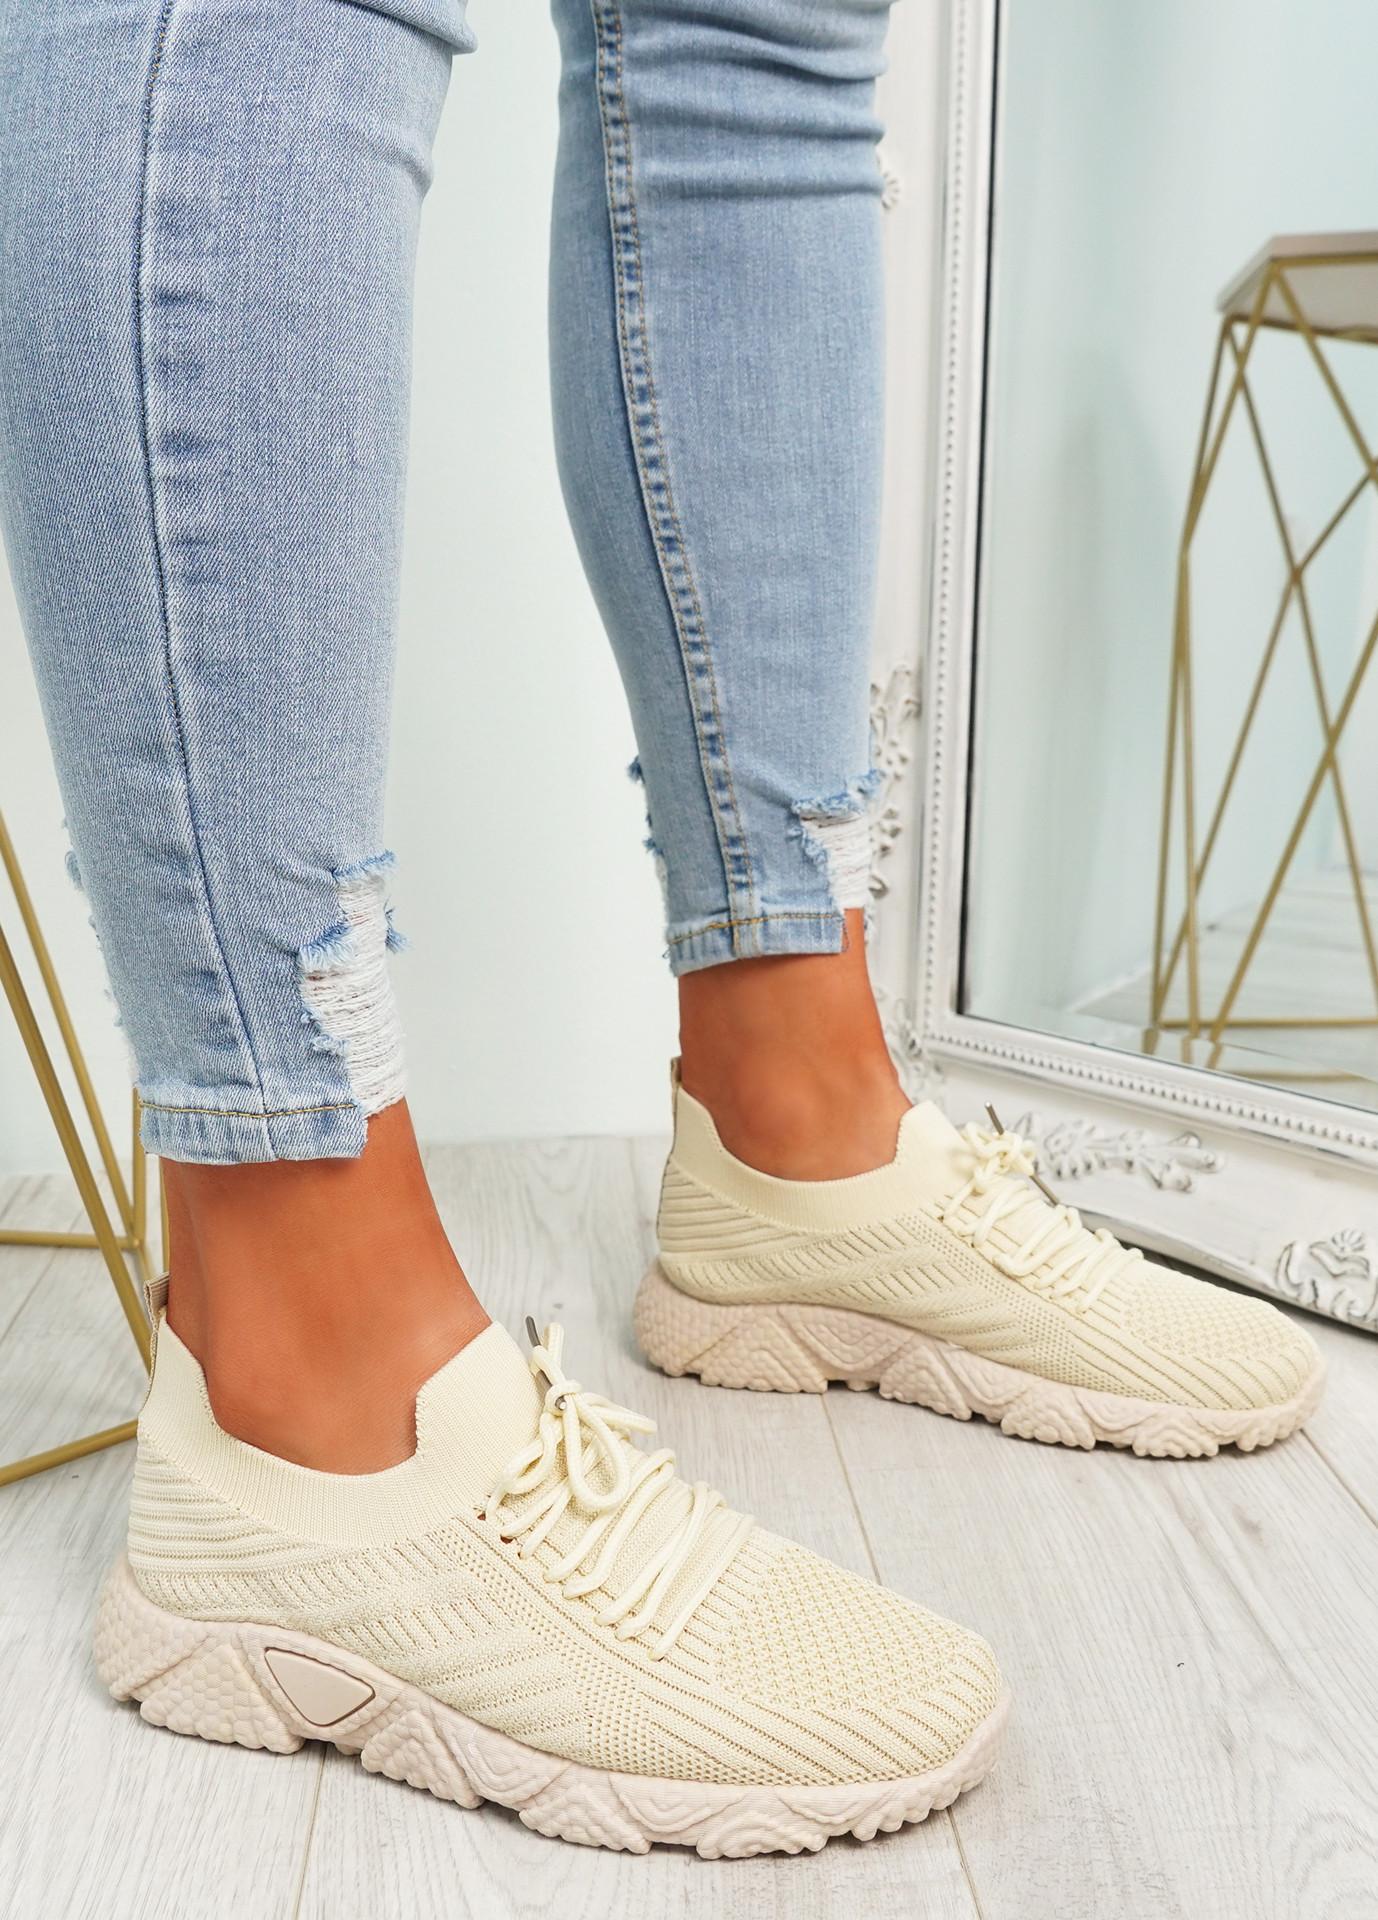 Brammi Beige Knit Sneakers